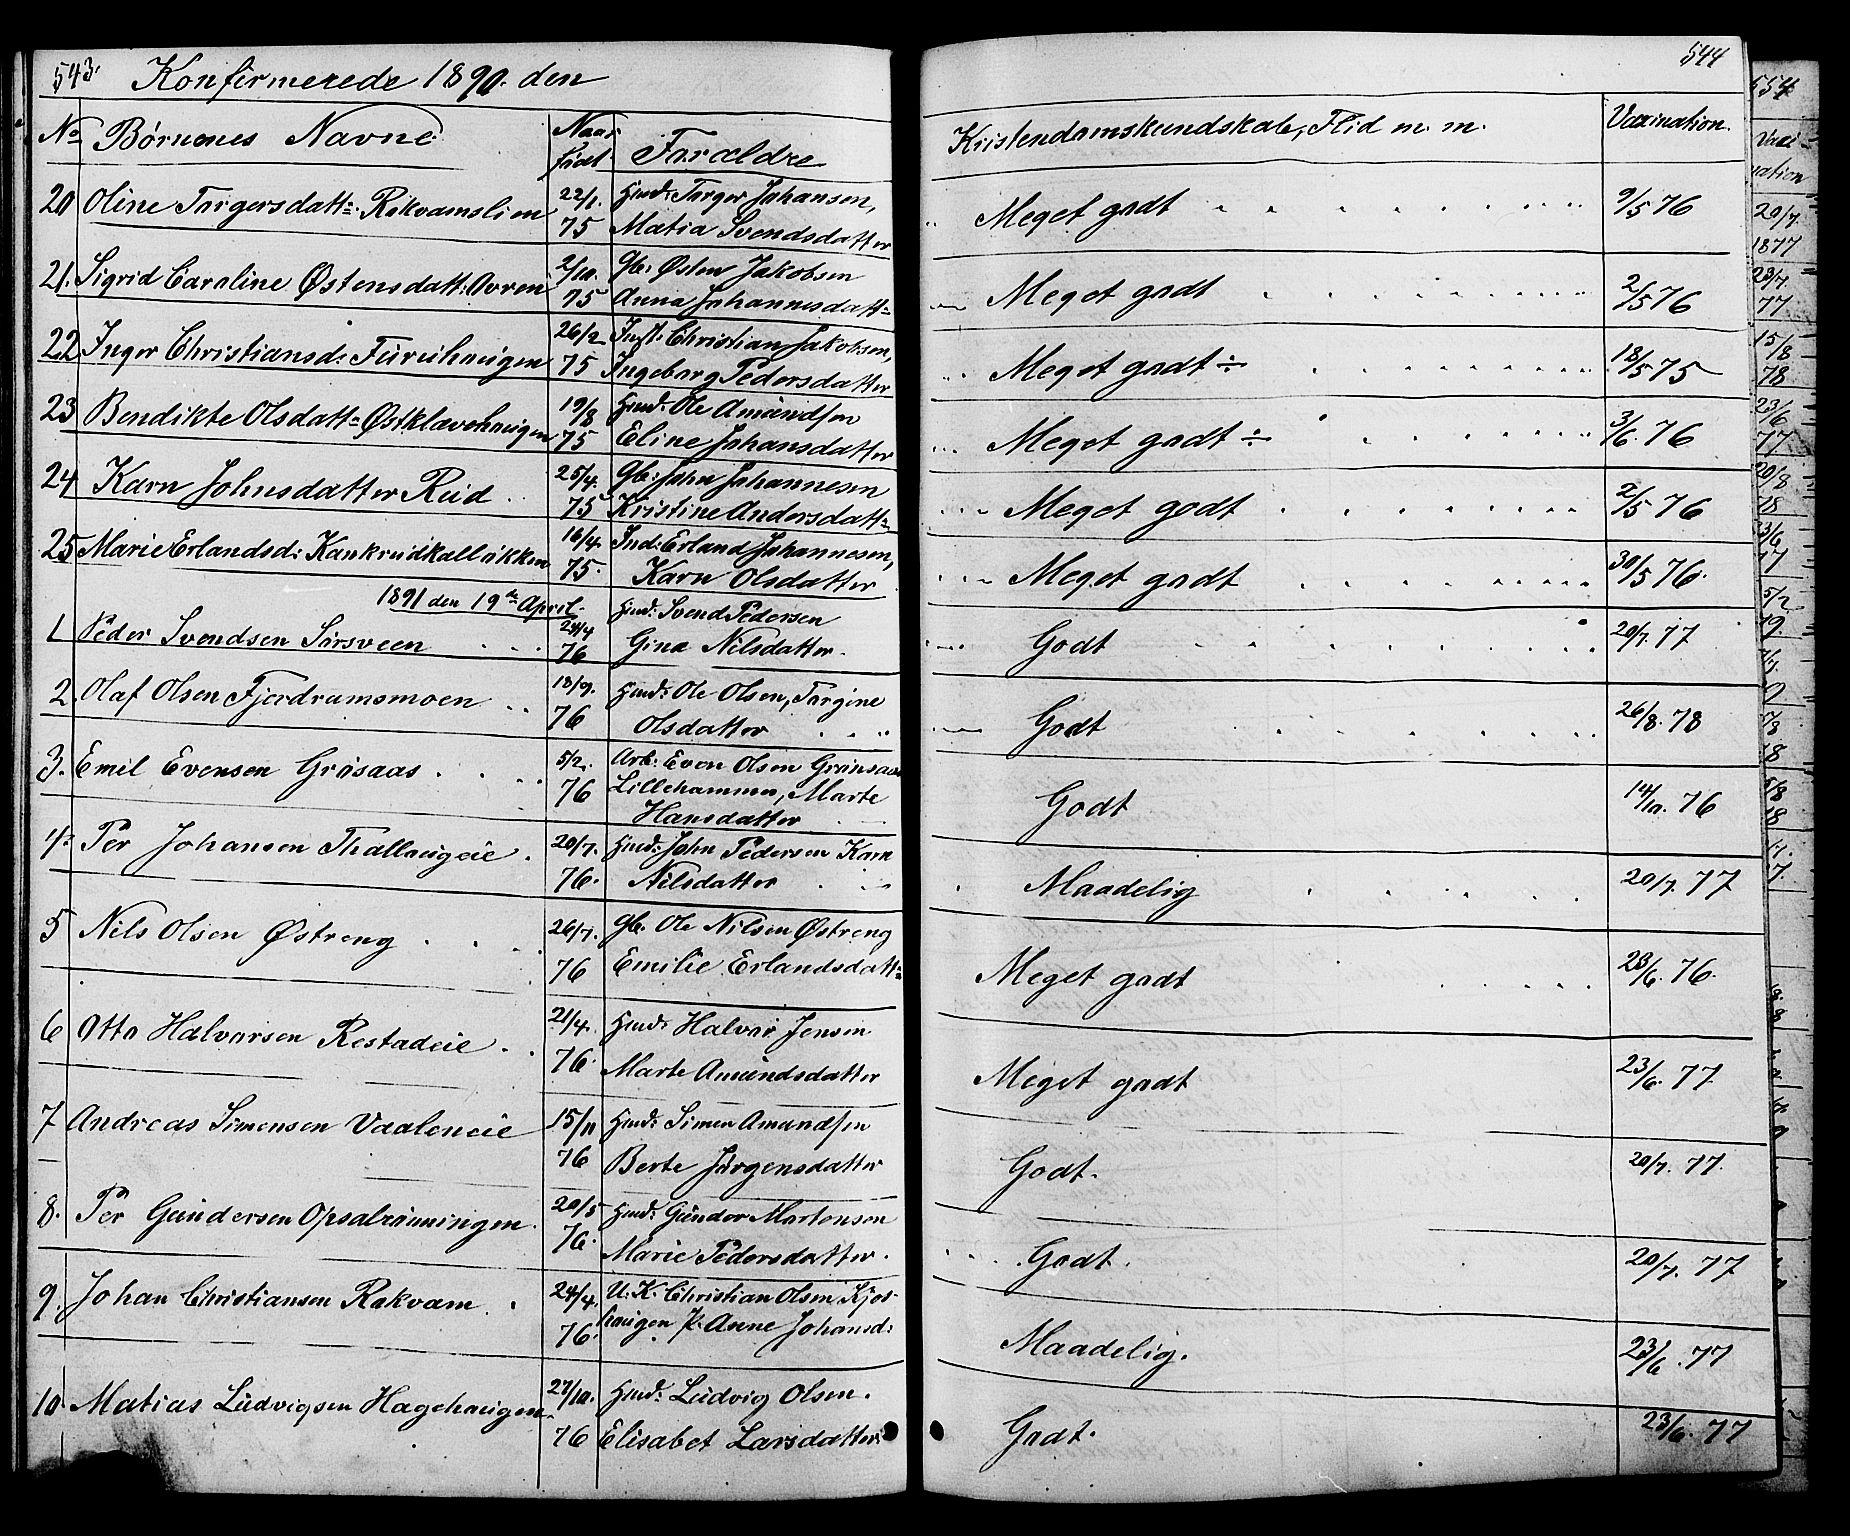 SAH, Østre Gausdal prestekontor, Klokkerbok nr. 1, 1863-1893, s. 543-544